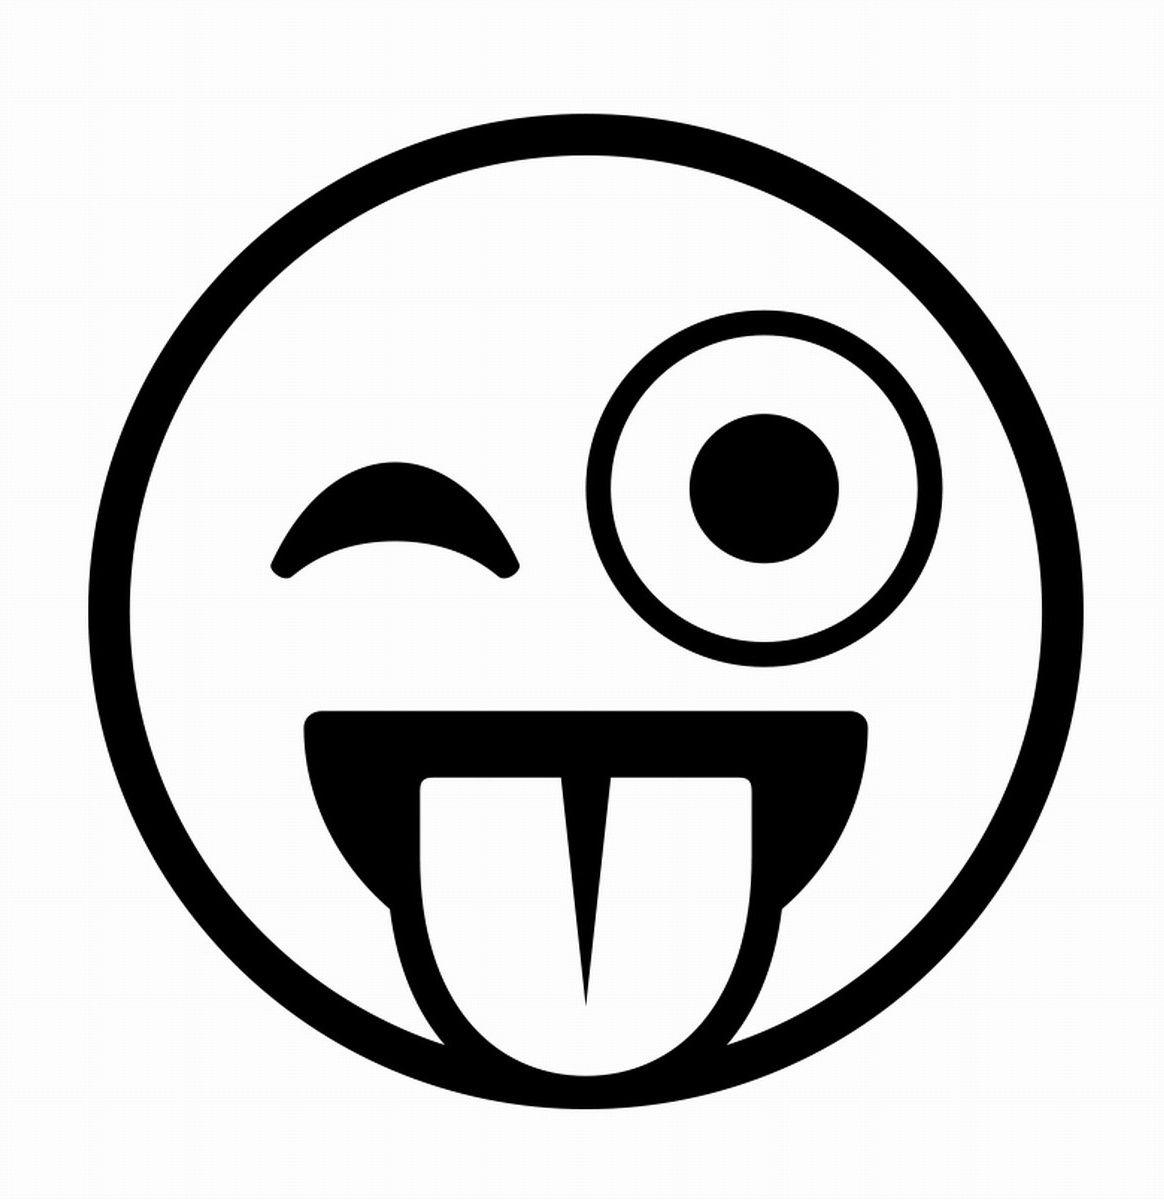 10 Unique De Dessin A Imprimer Emoji Image Emoji Coloring Pages Coloring Pages Cartoon Coloring Pages